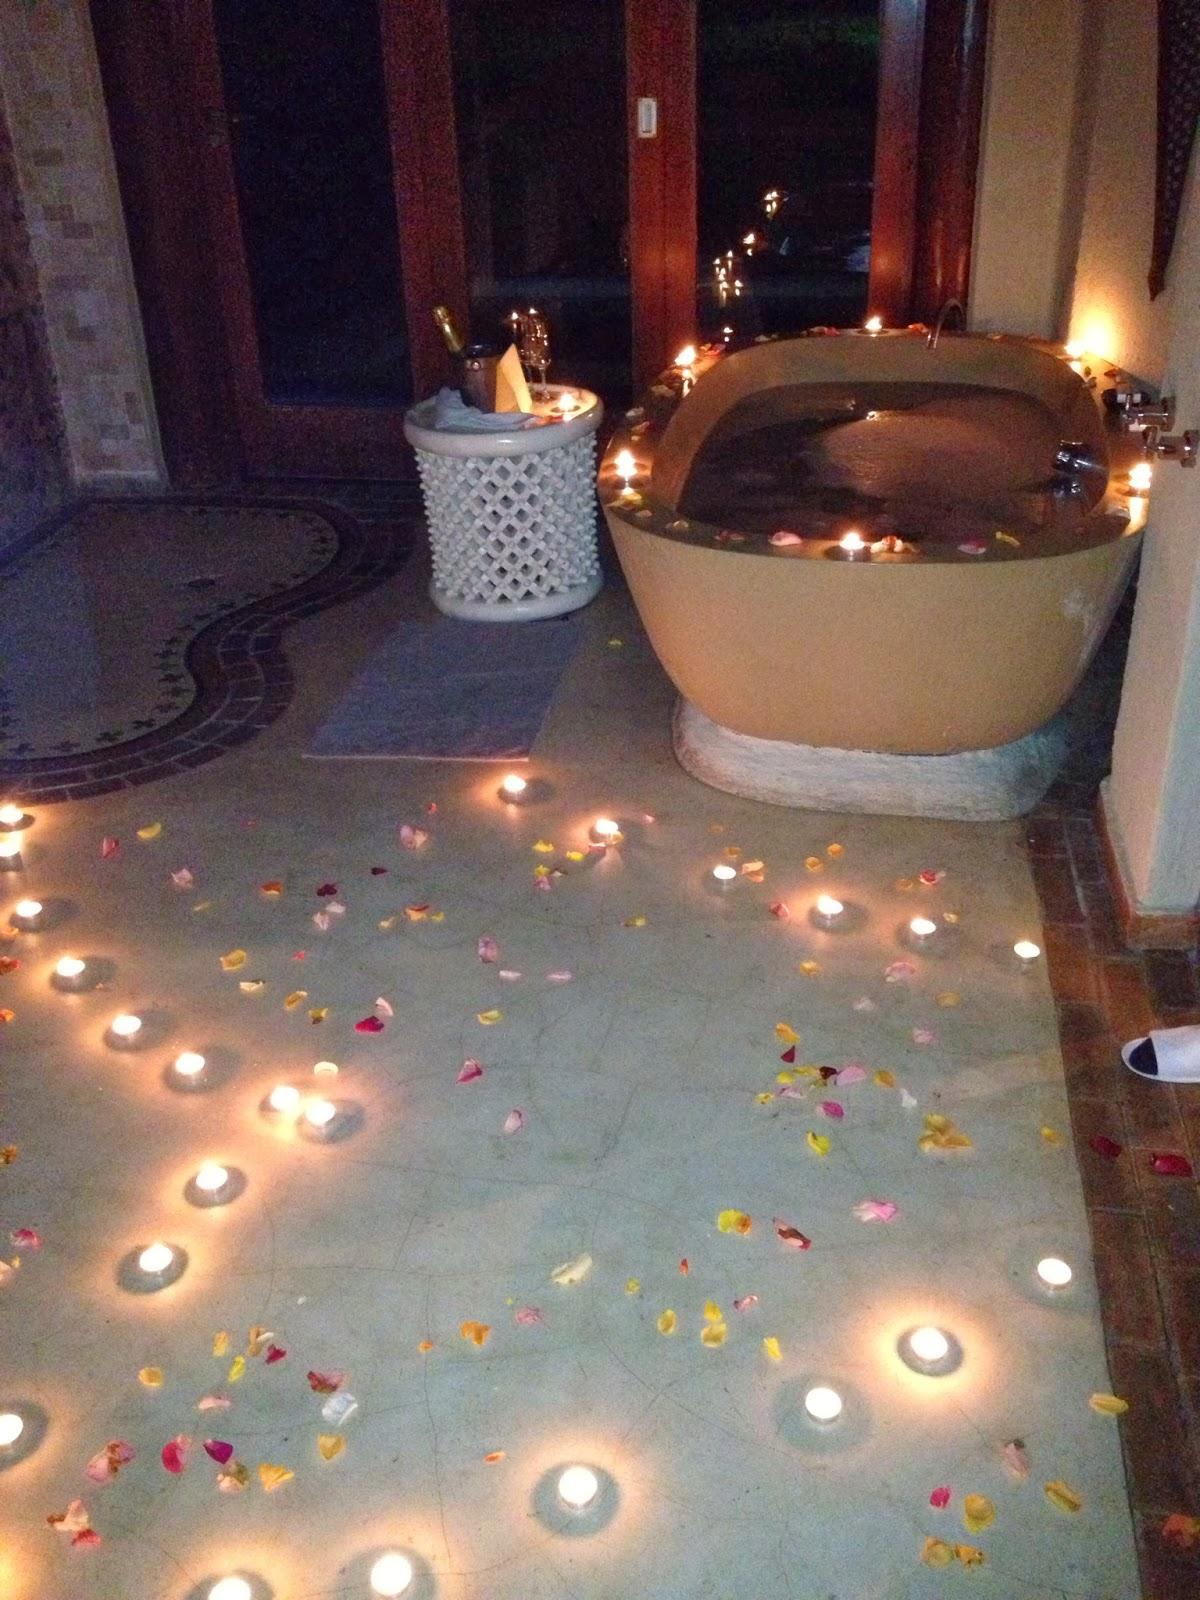 Sabi Sands - A bath drawn and candles everywhere in the bathroom